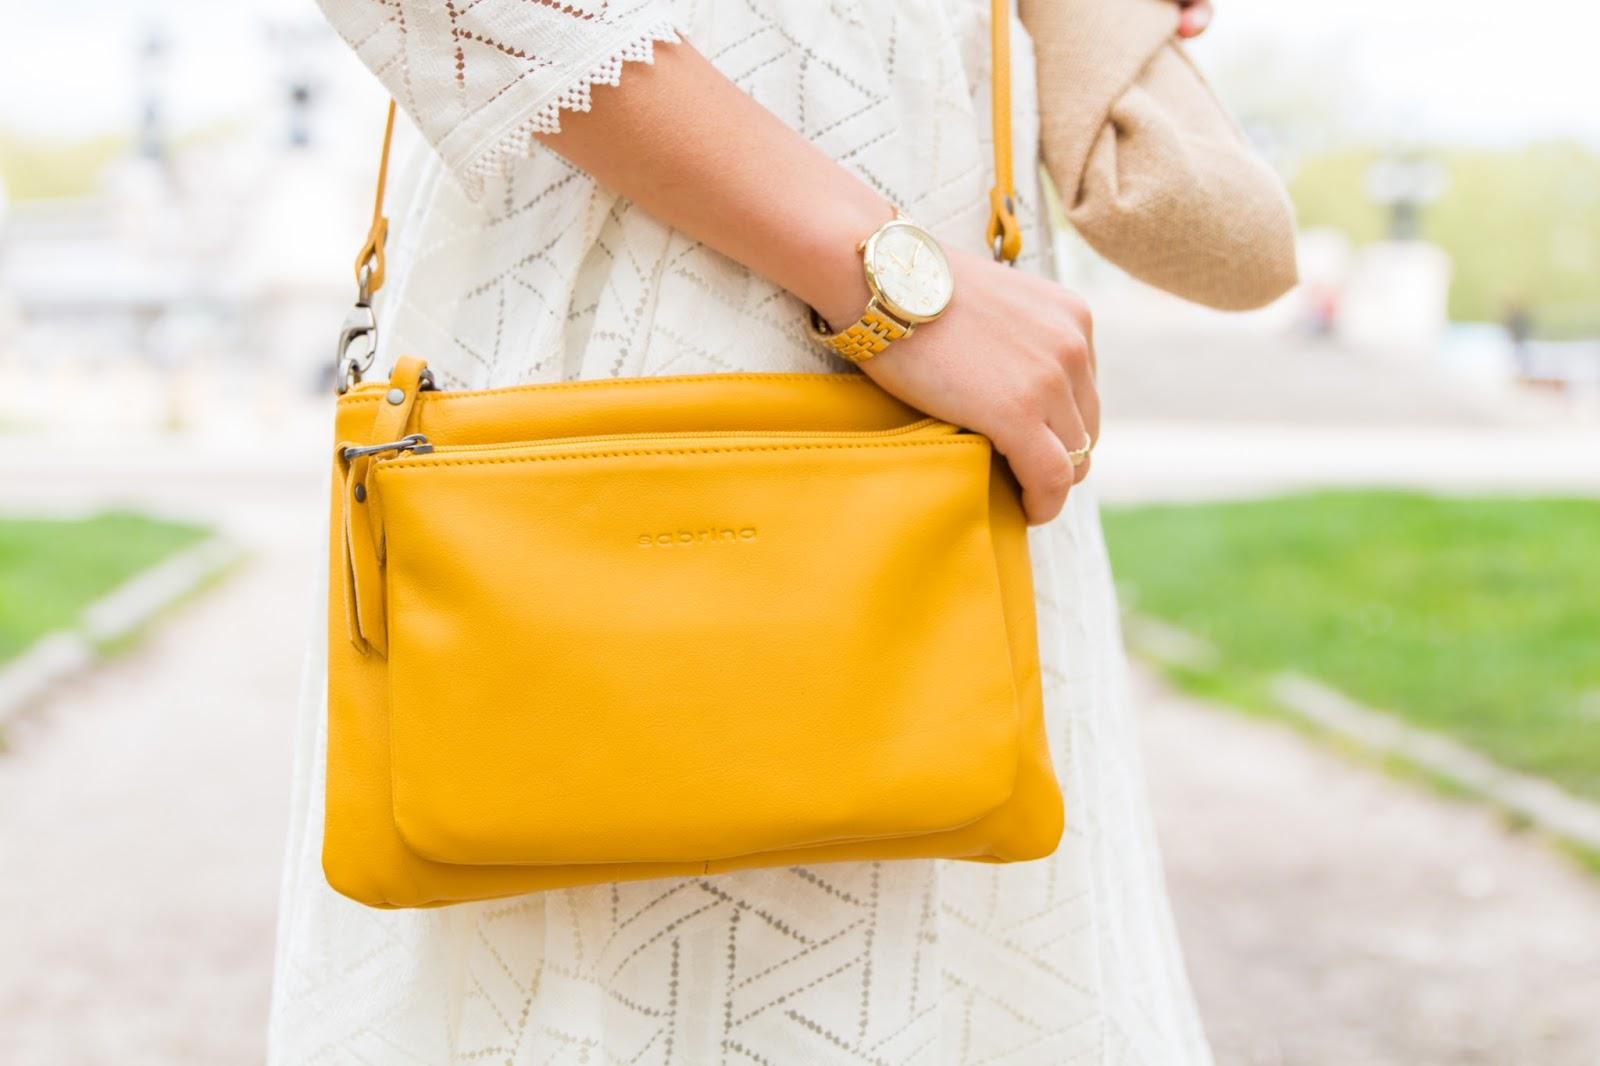 pochette jaune sabrina